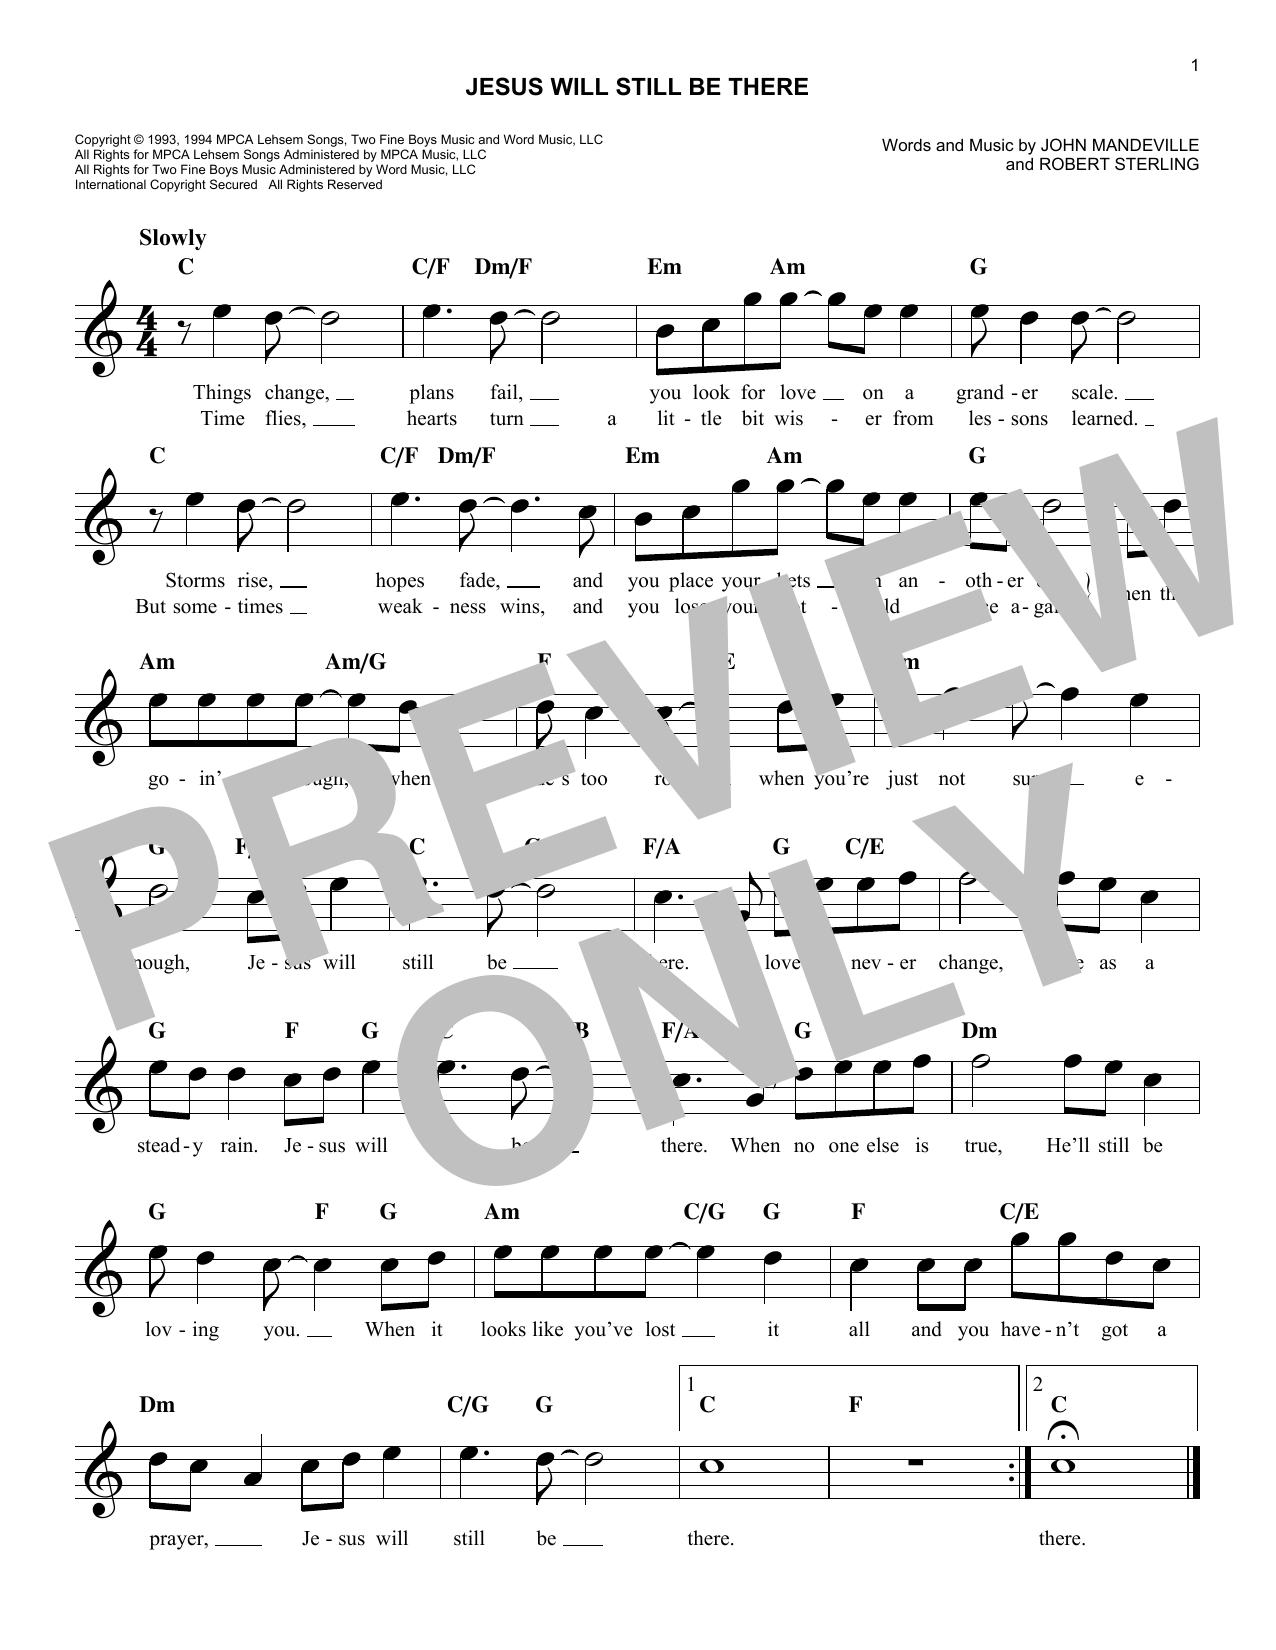 Sheet Music Digital Files To Print Licensed Inspirational Digital